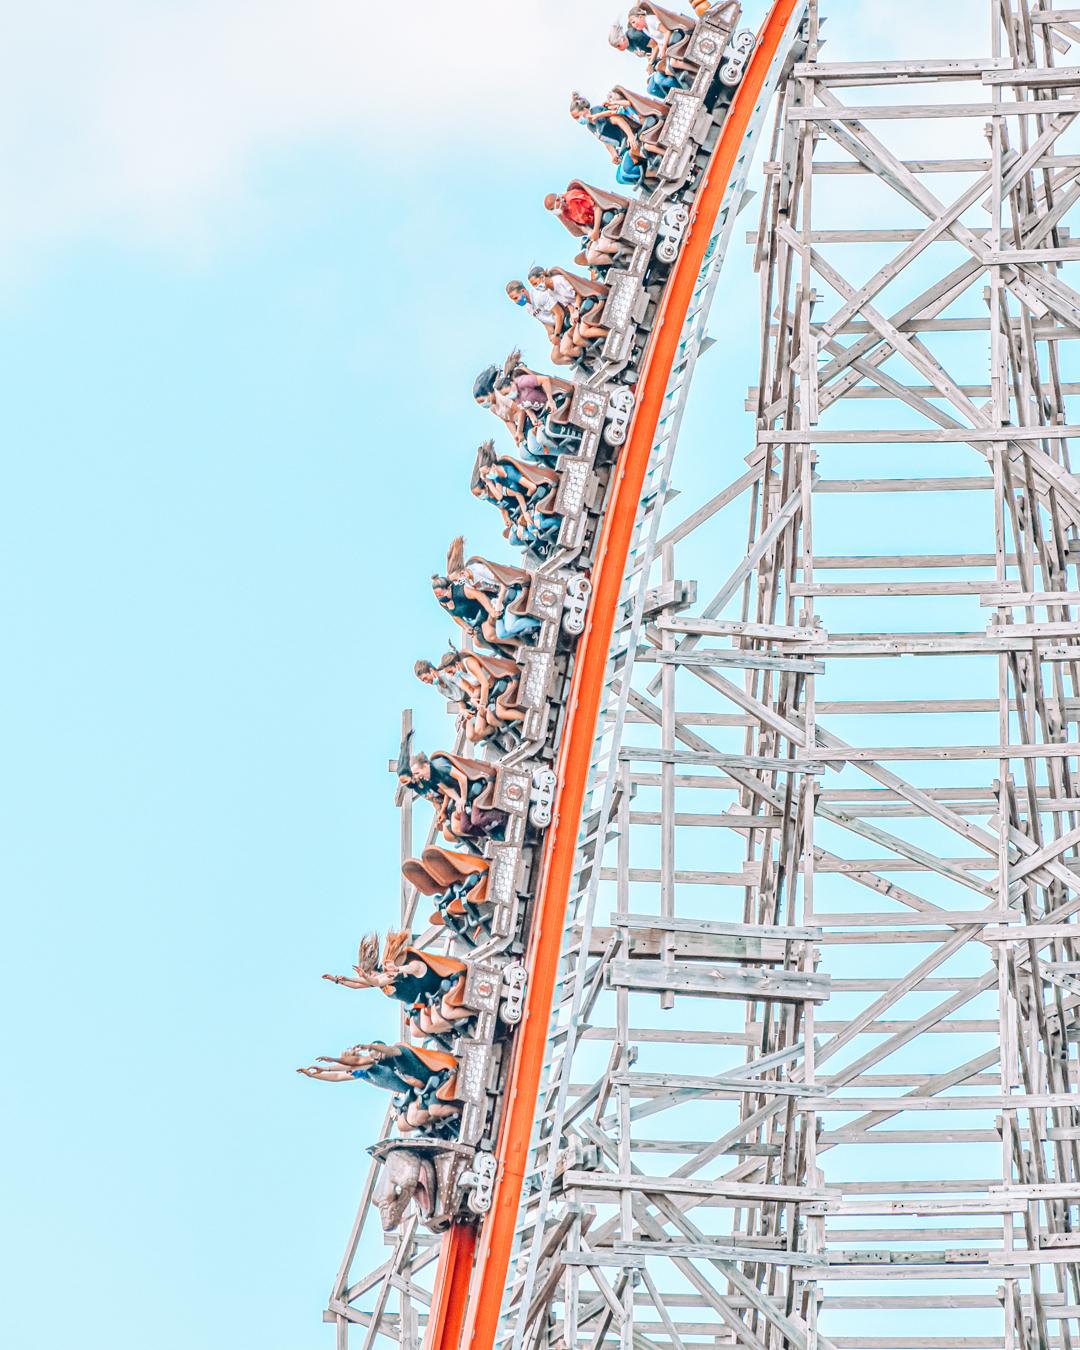 Roller coaster at Six Flags Fiesta Texas